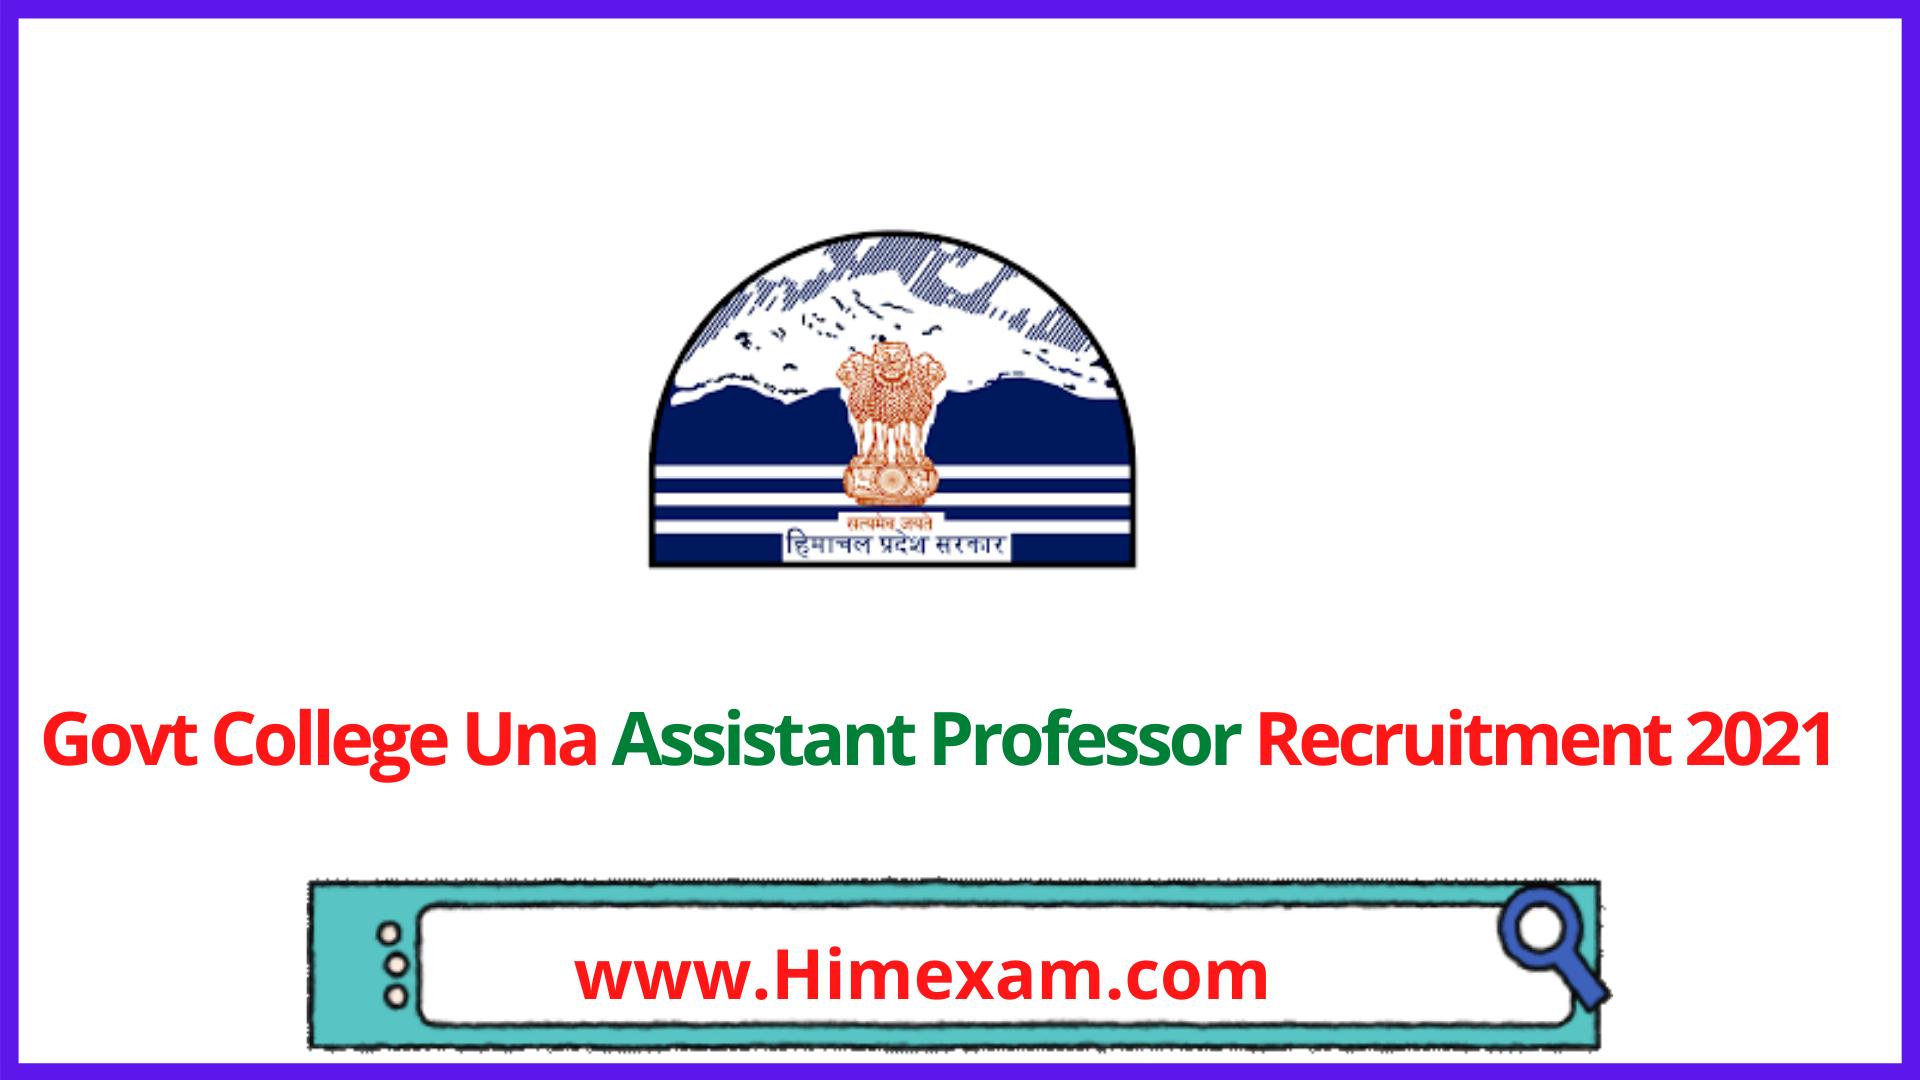 Govt College Una Assistant Professor Recruitment 2021